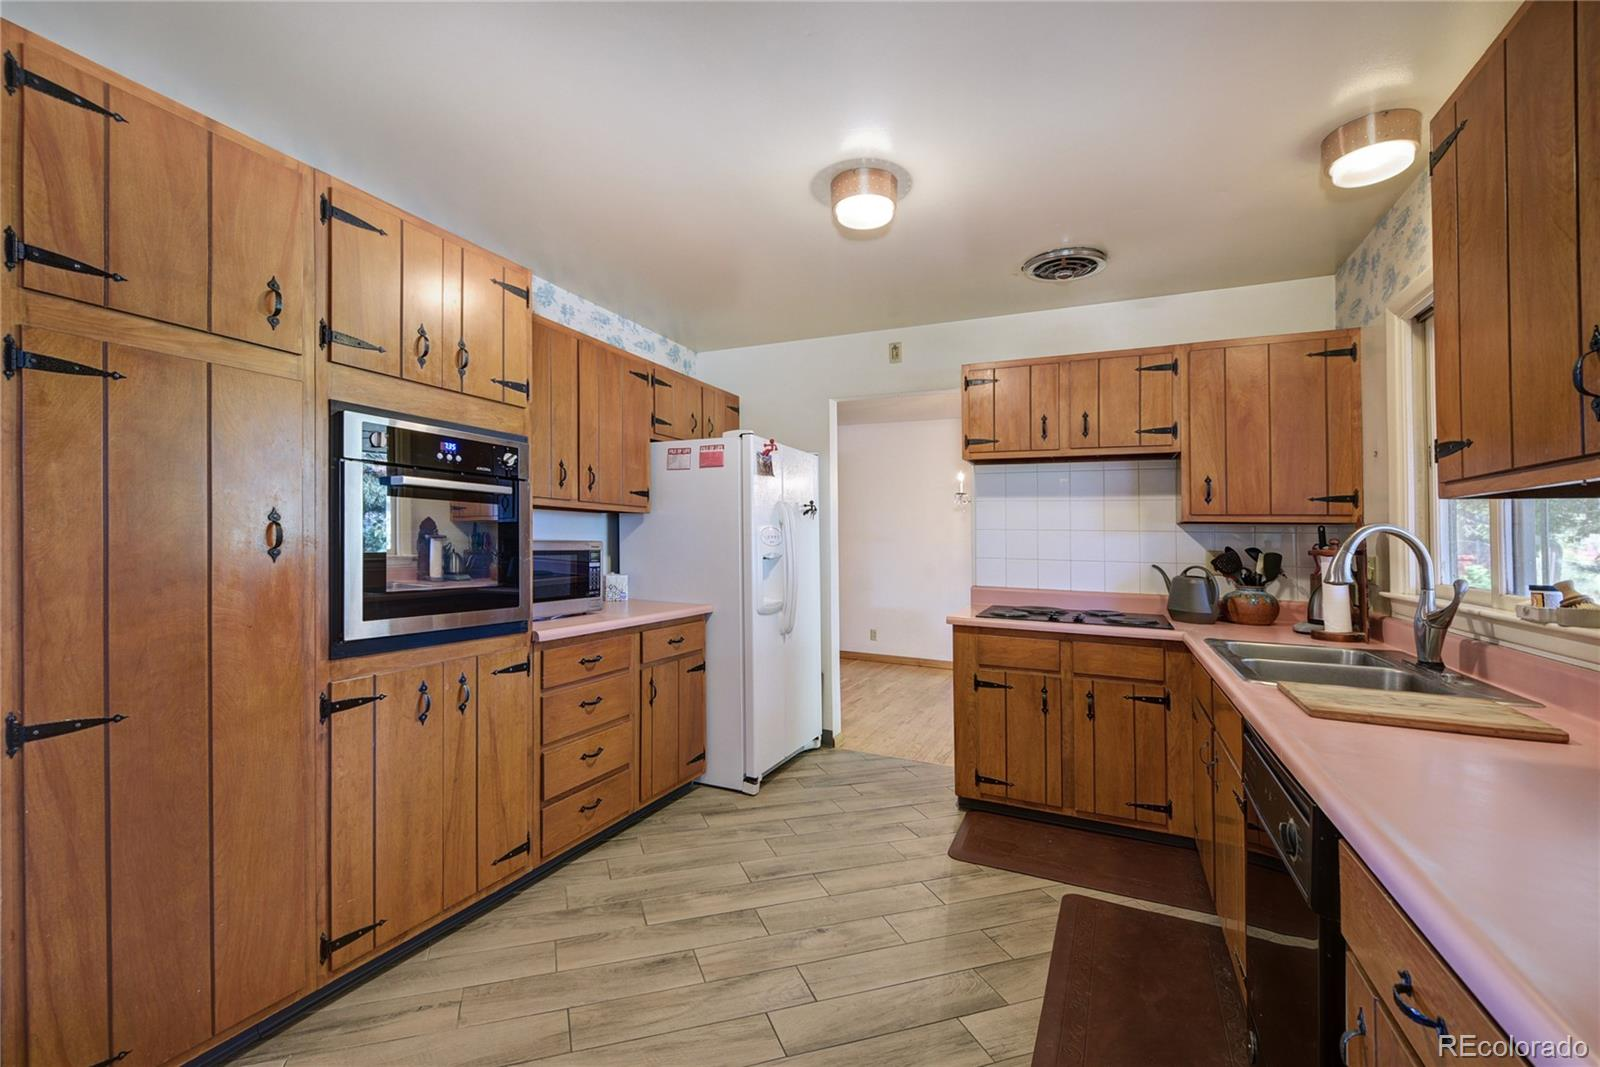 MLS# 3086362 - 19 - 2445 Balsam Drive, Boulder, CO 80304